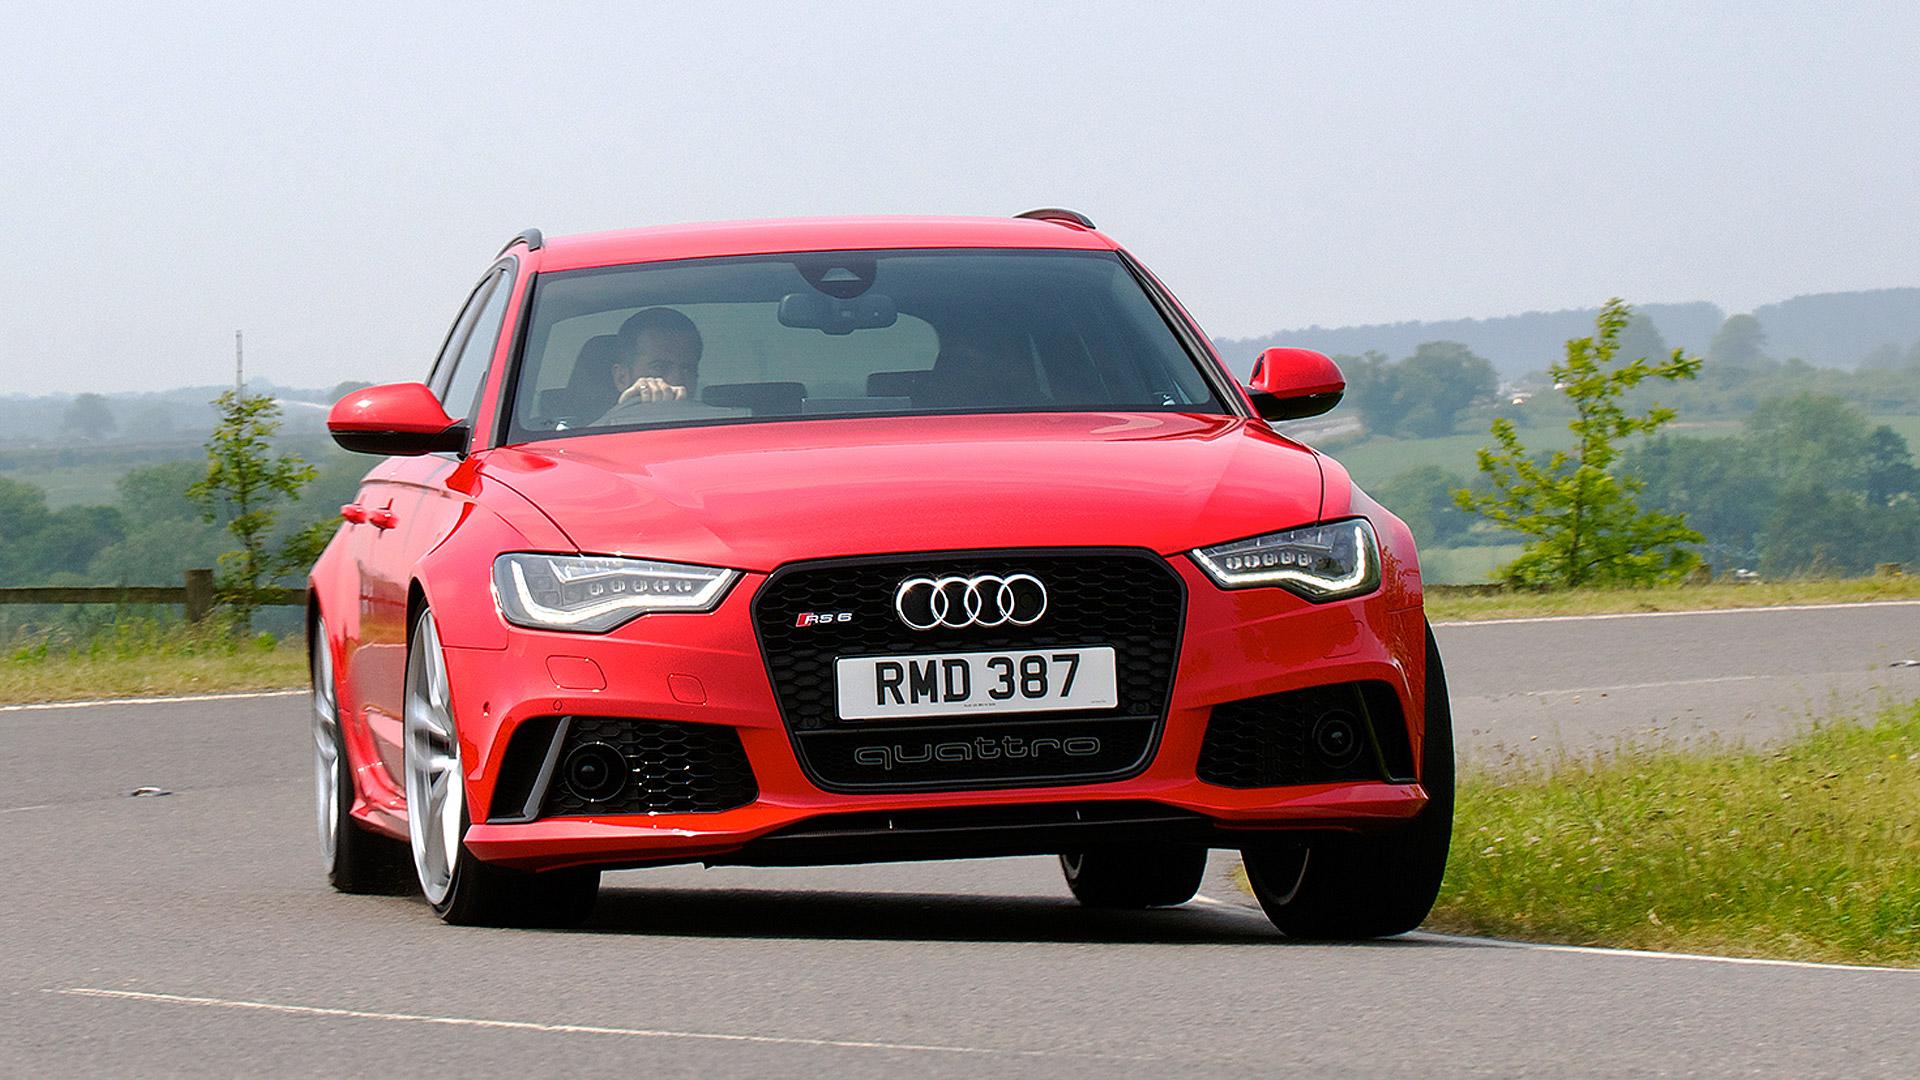 Audi RS 6 Avant 2015 STD